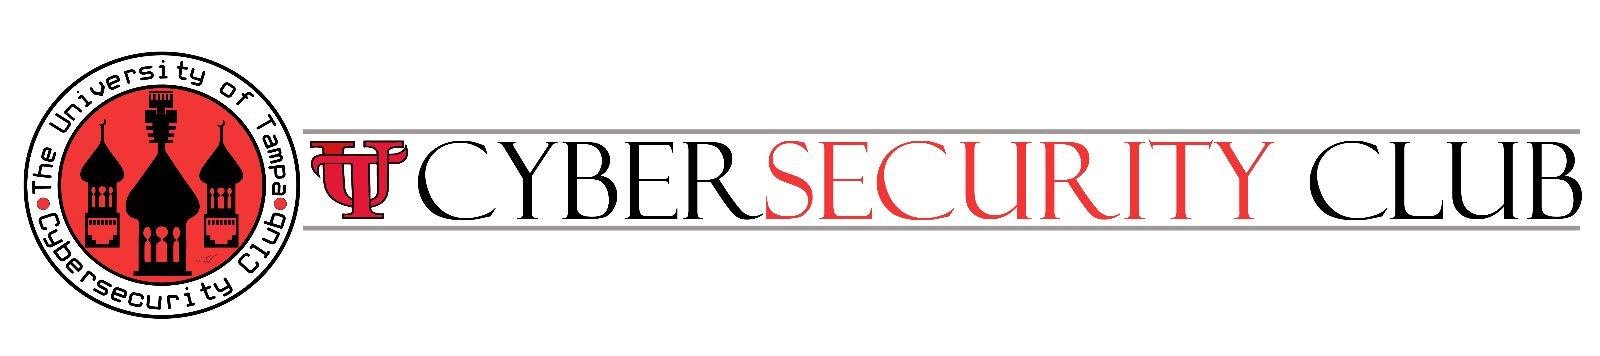 UT Cybersecurity Club